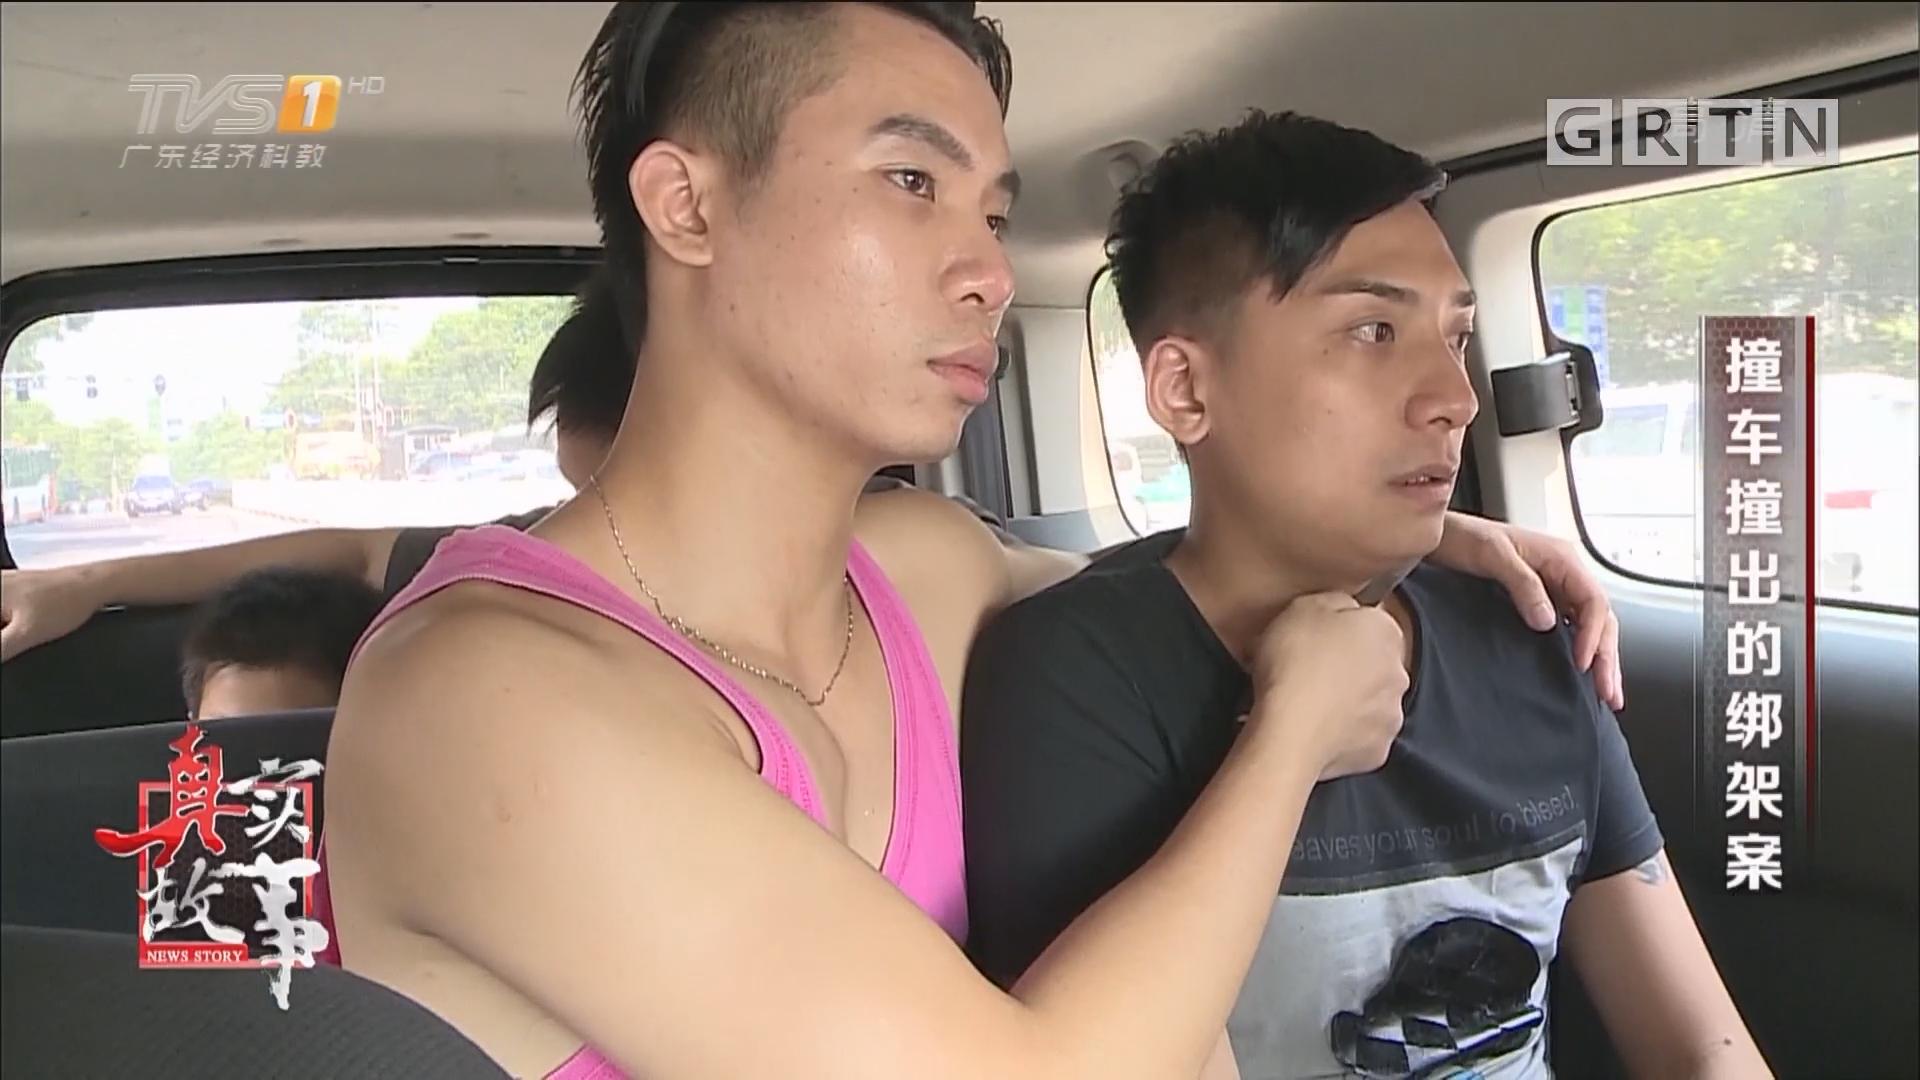 [HD][2017-11-29]真实故事:撞车撞出的绑架案